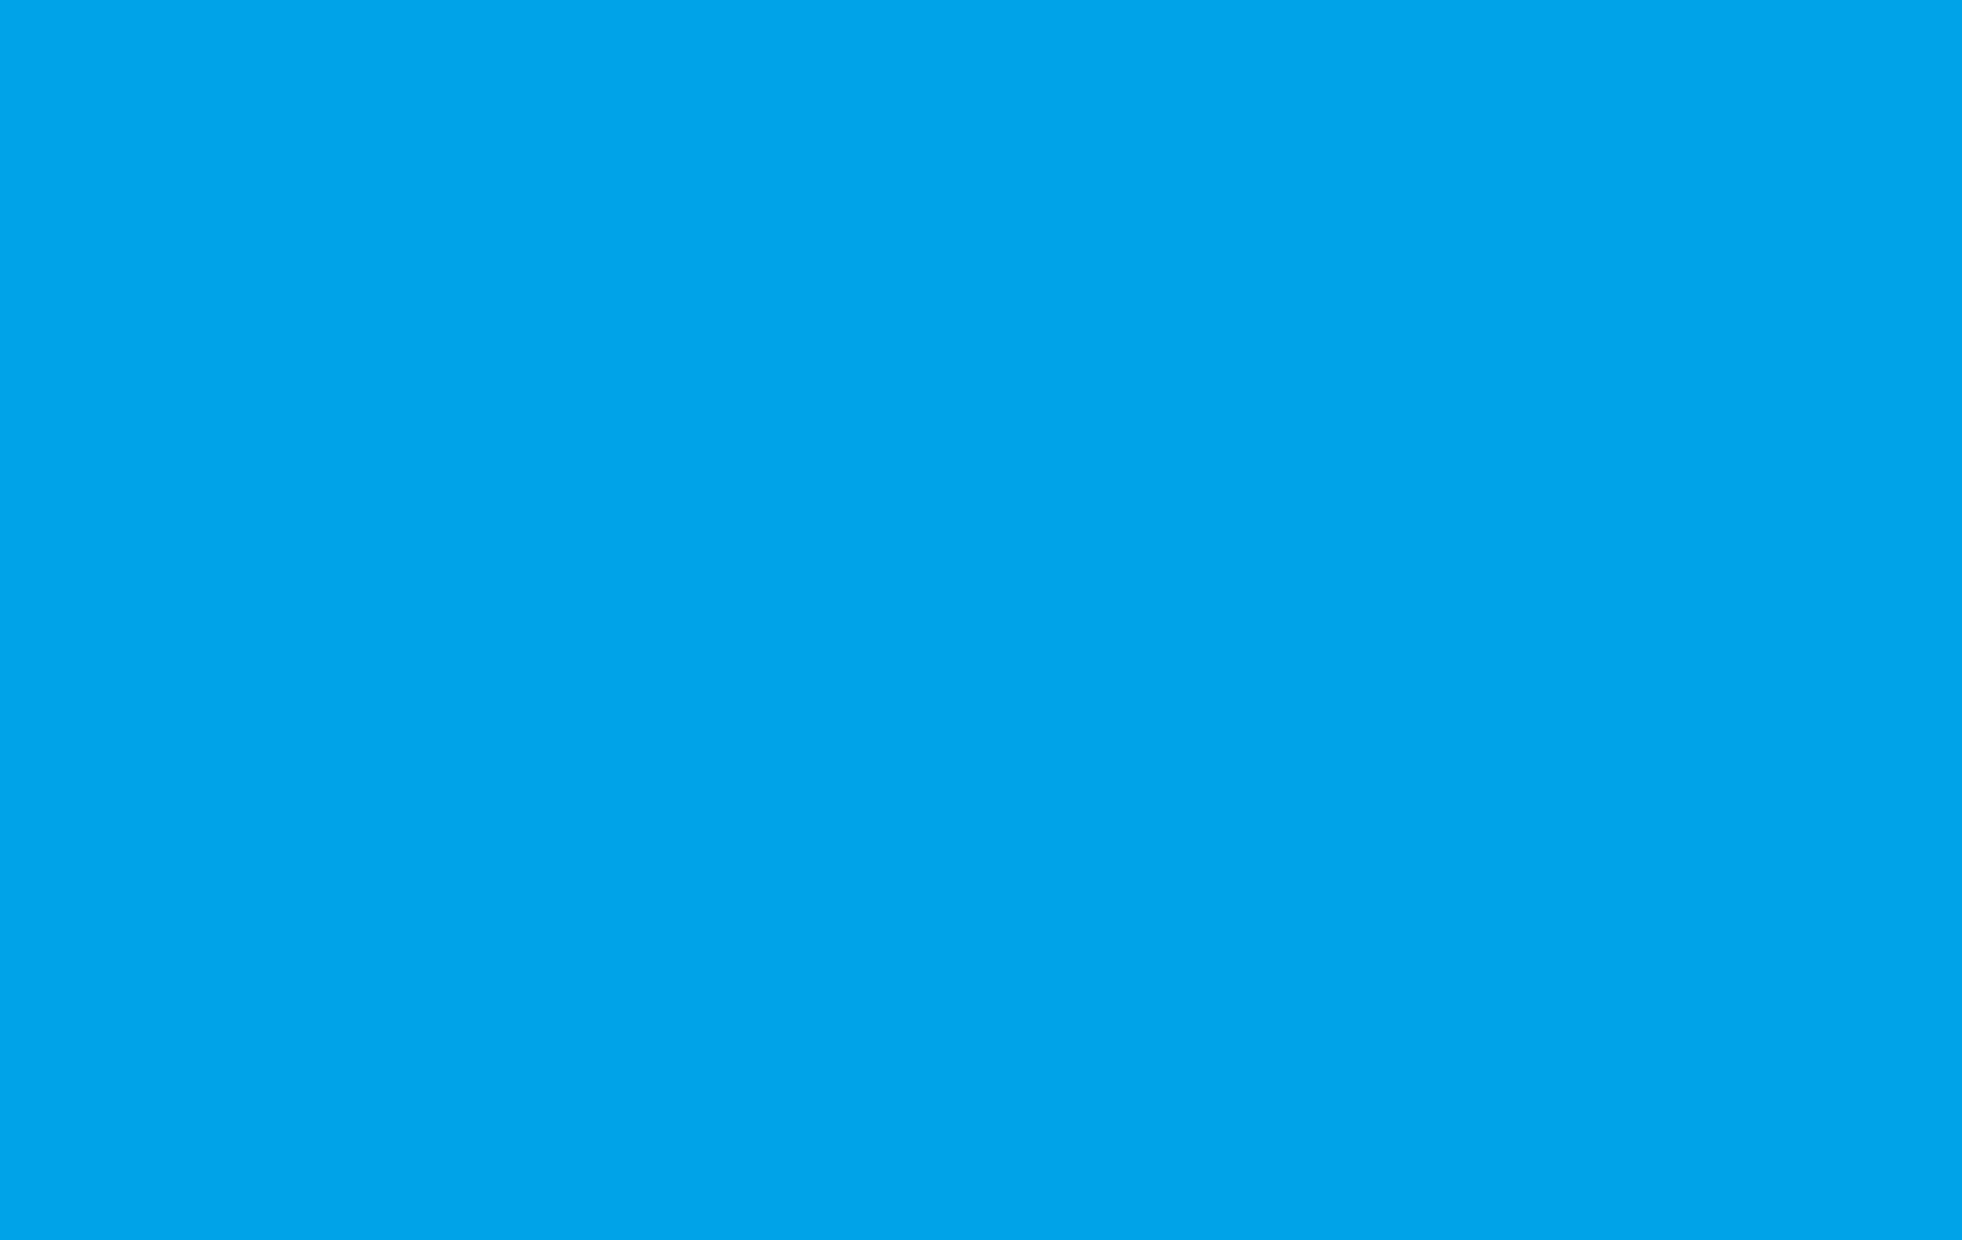 blu hinnerk gab rik Leo  blu hinnerk gab rik Leo